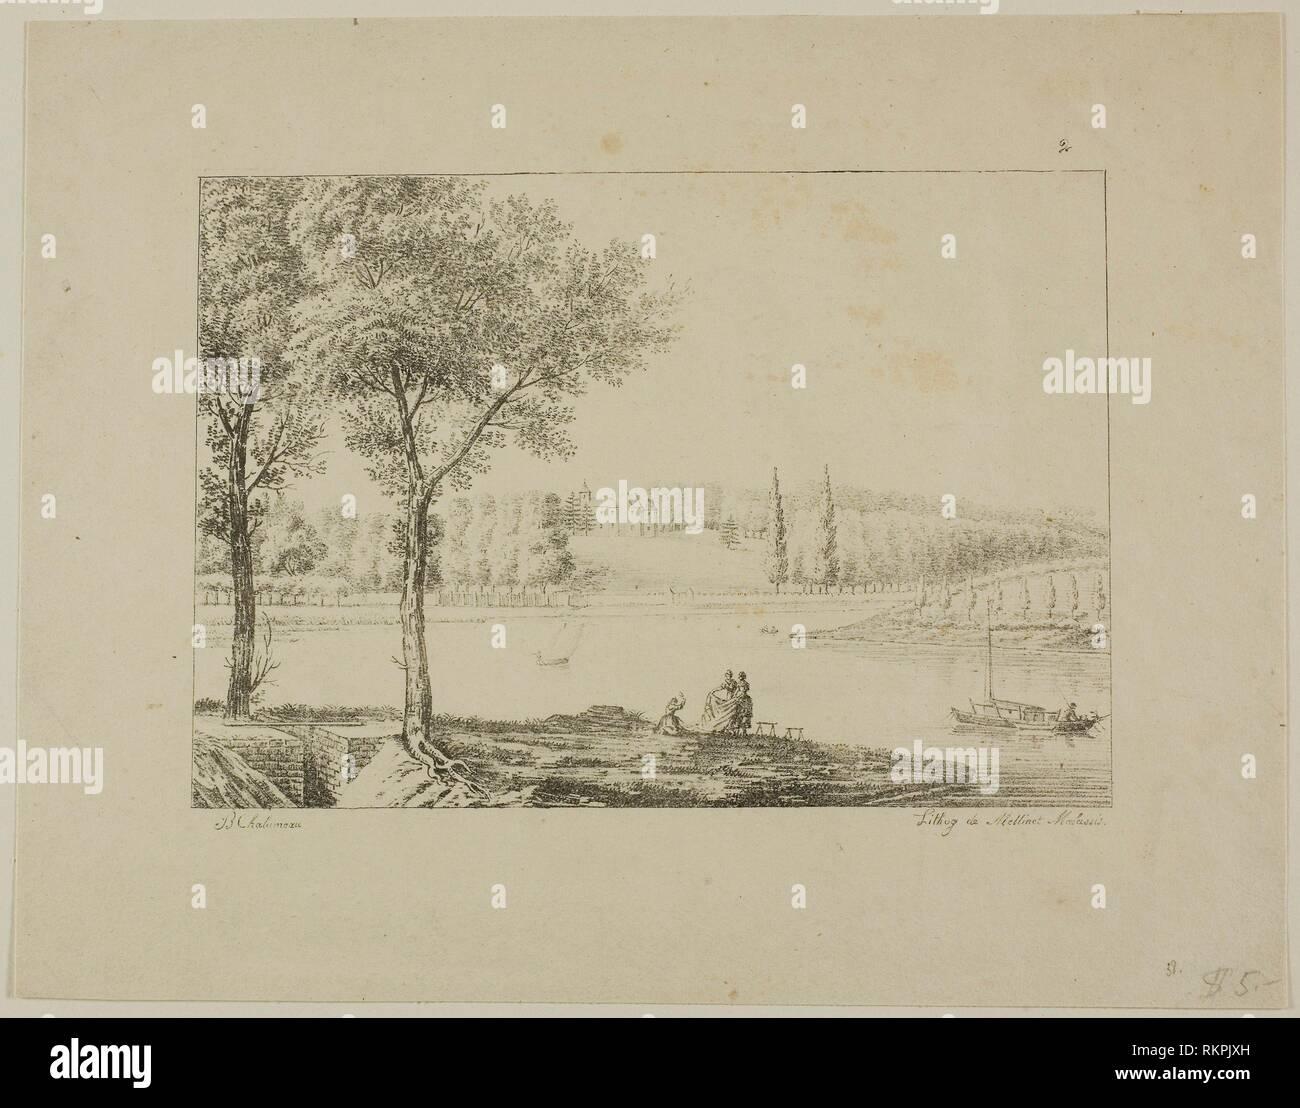 Paesaggio - 1820-1830 - B. Chalameau (Francese) stampate da Mellinet-Malassis (Francese, 1800-1899) - Artista: B. Chalameau, PROVENIENZA: FRANCIA, Data: Immagini Stock